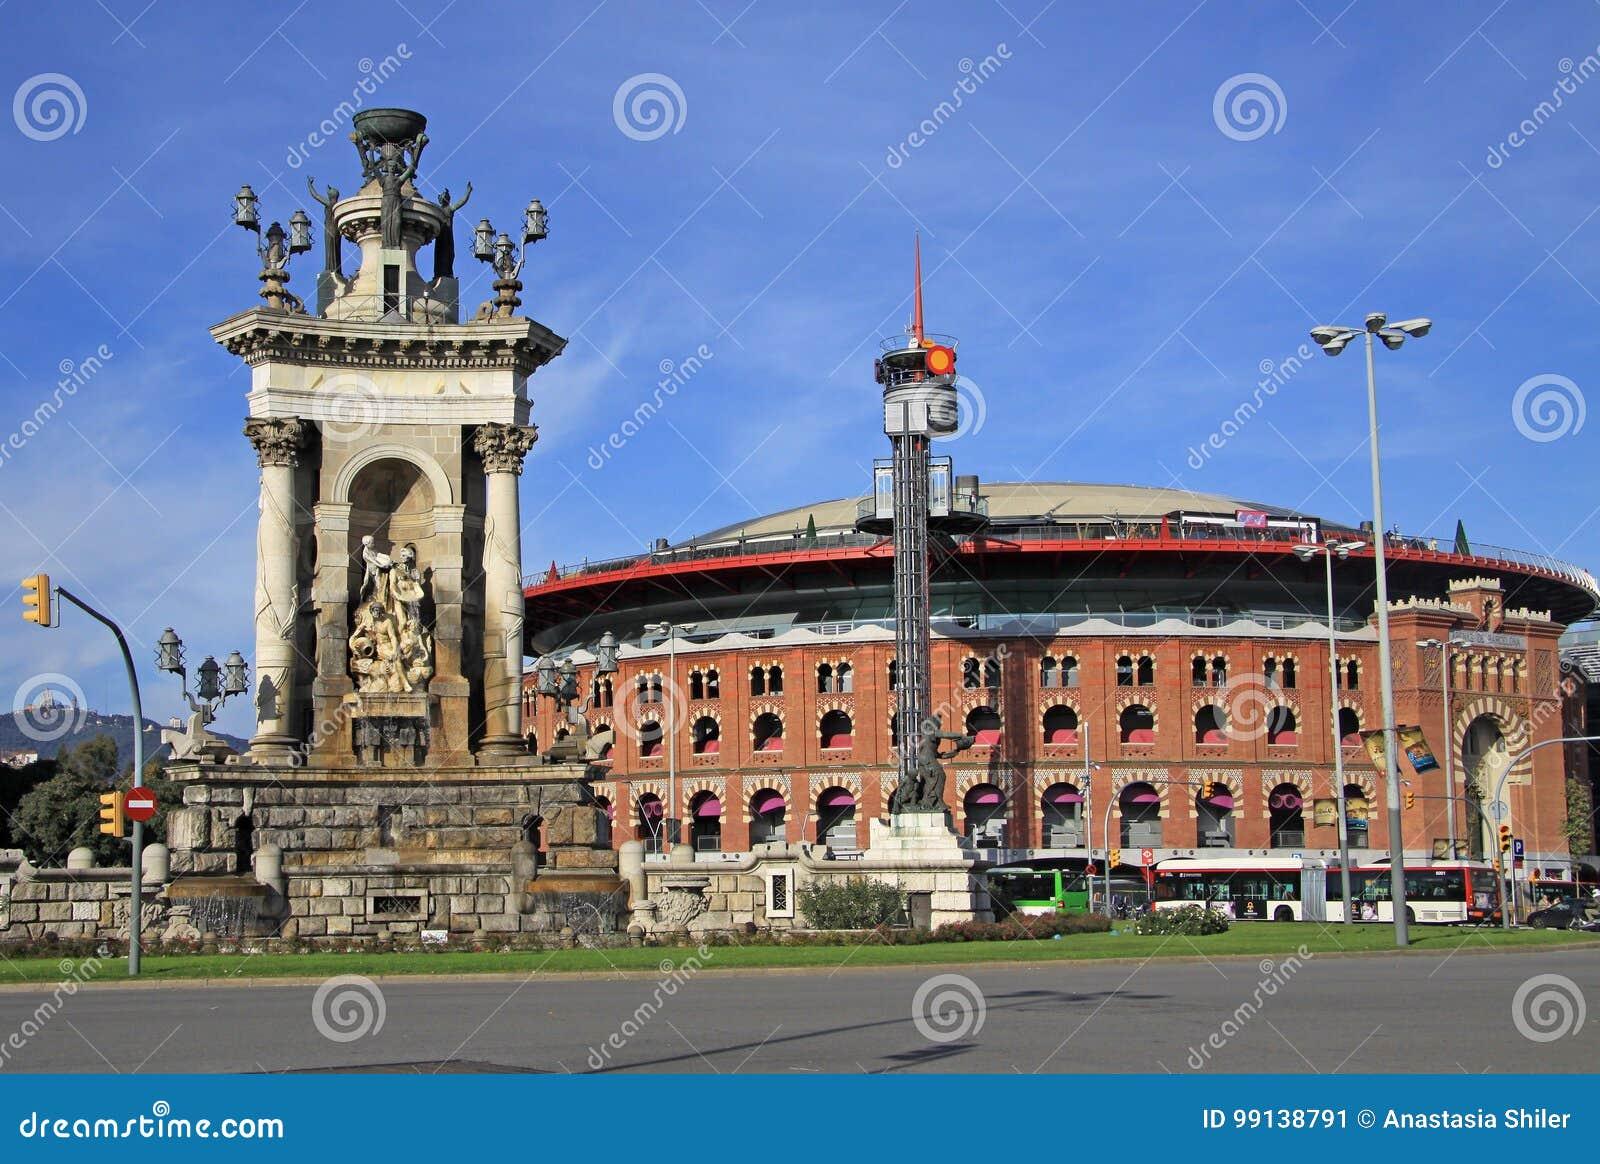 25e5ab6402ea Χώρος αρενών ταυρομαχίας στην πλατεία της Ισπανίας στη Βαρκελώνη ...